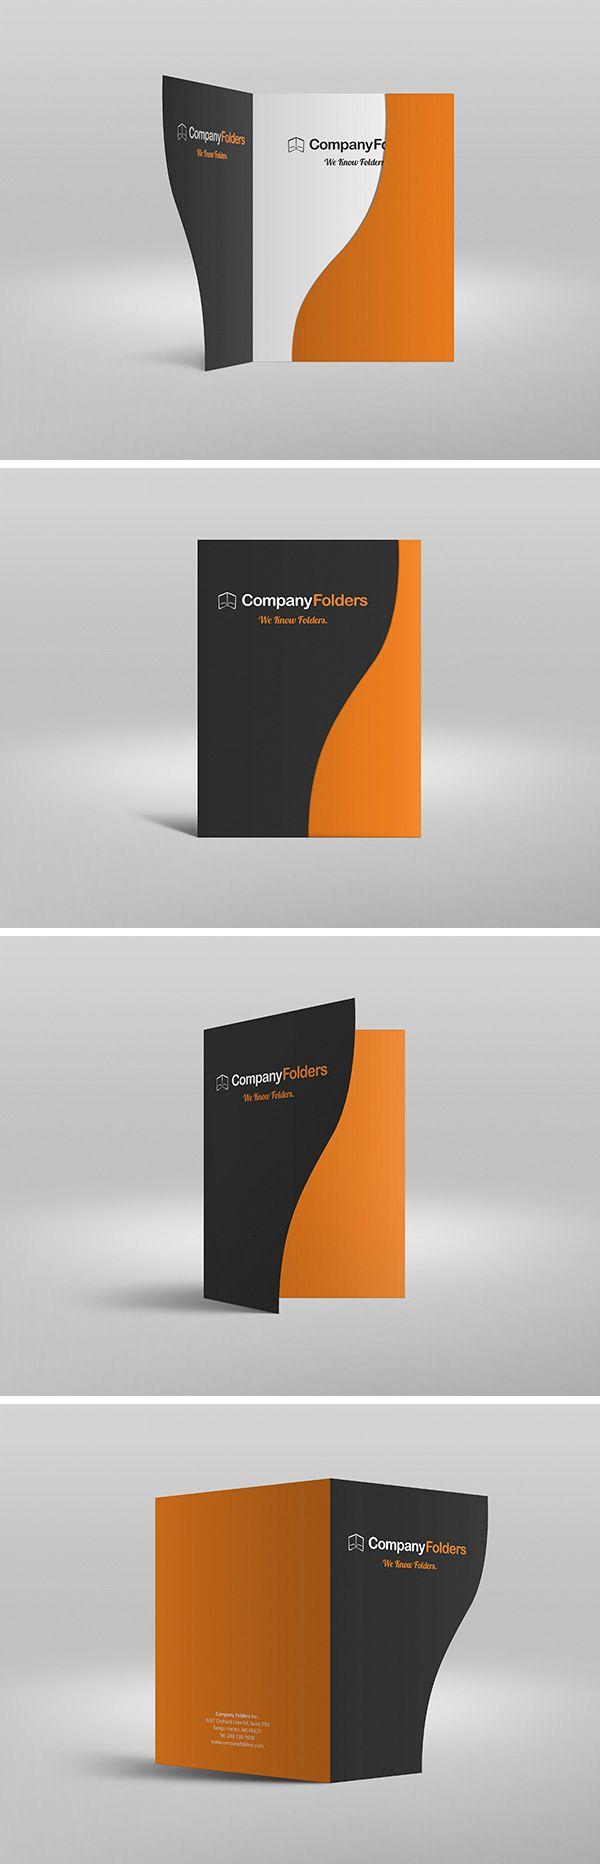 Serpentine Presentation Folder Mockup Graphicburger Folder Mockup Presentation Folder Folder Design